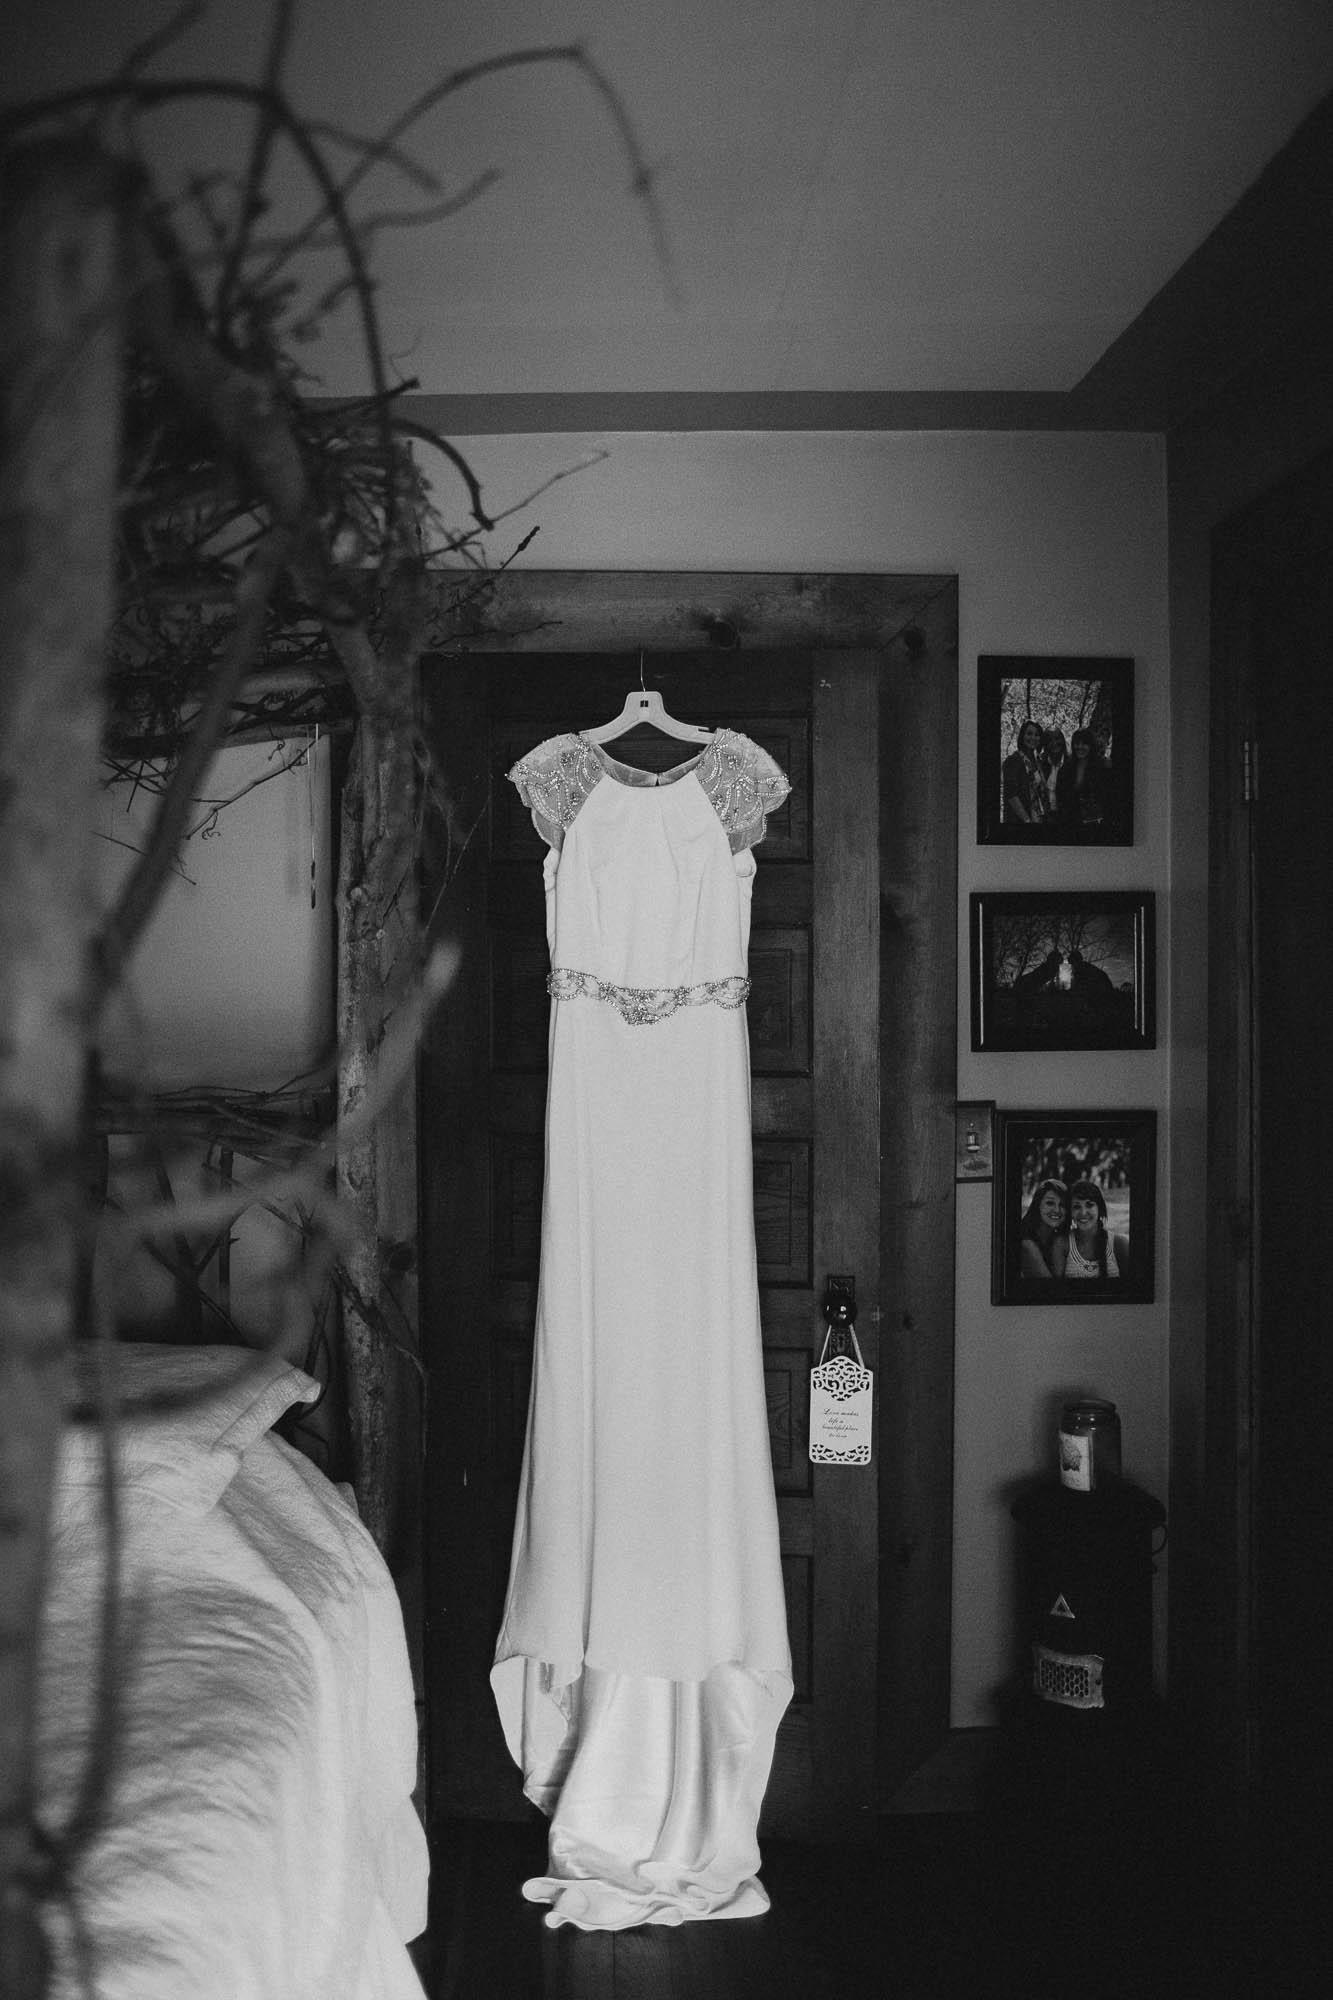 Leah-Graham-Michigan-Outdoor-DIY-Wedding-029@2x.jpg